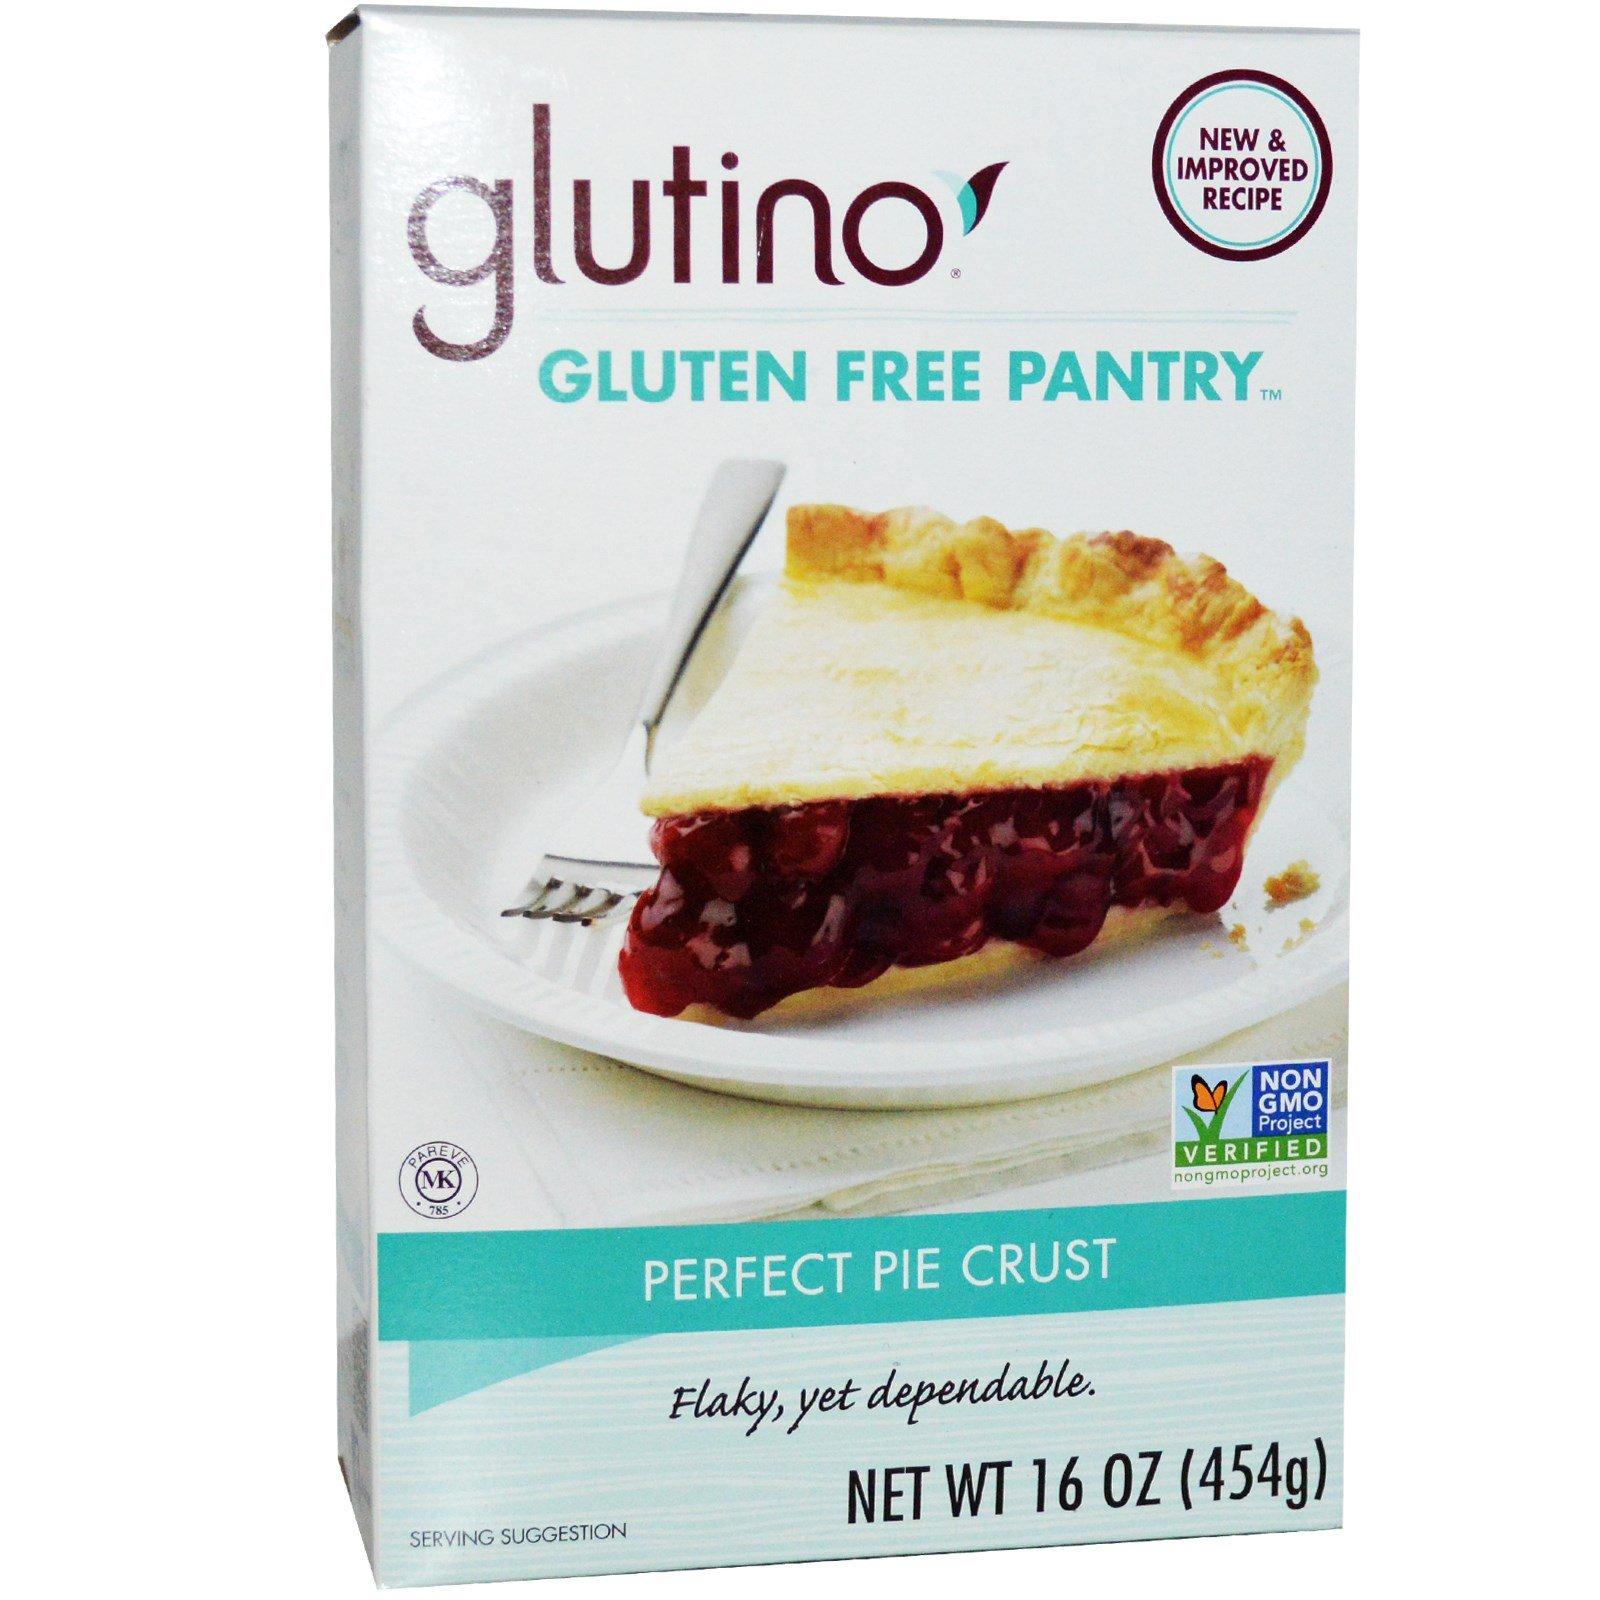 Gluten-Free Pantry, Glutino, Perfect Pie Crust, 16 oz (454 g) - 2pc